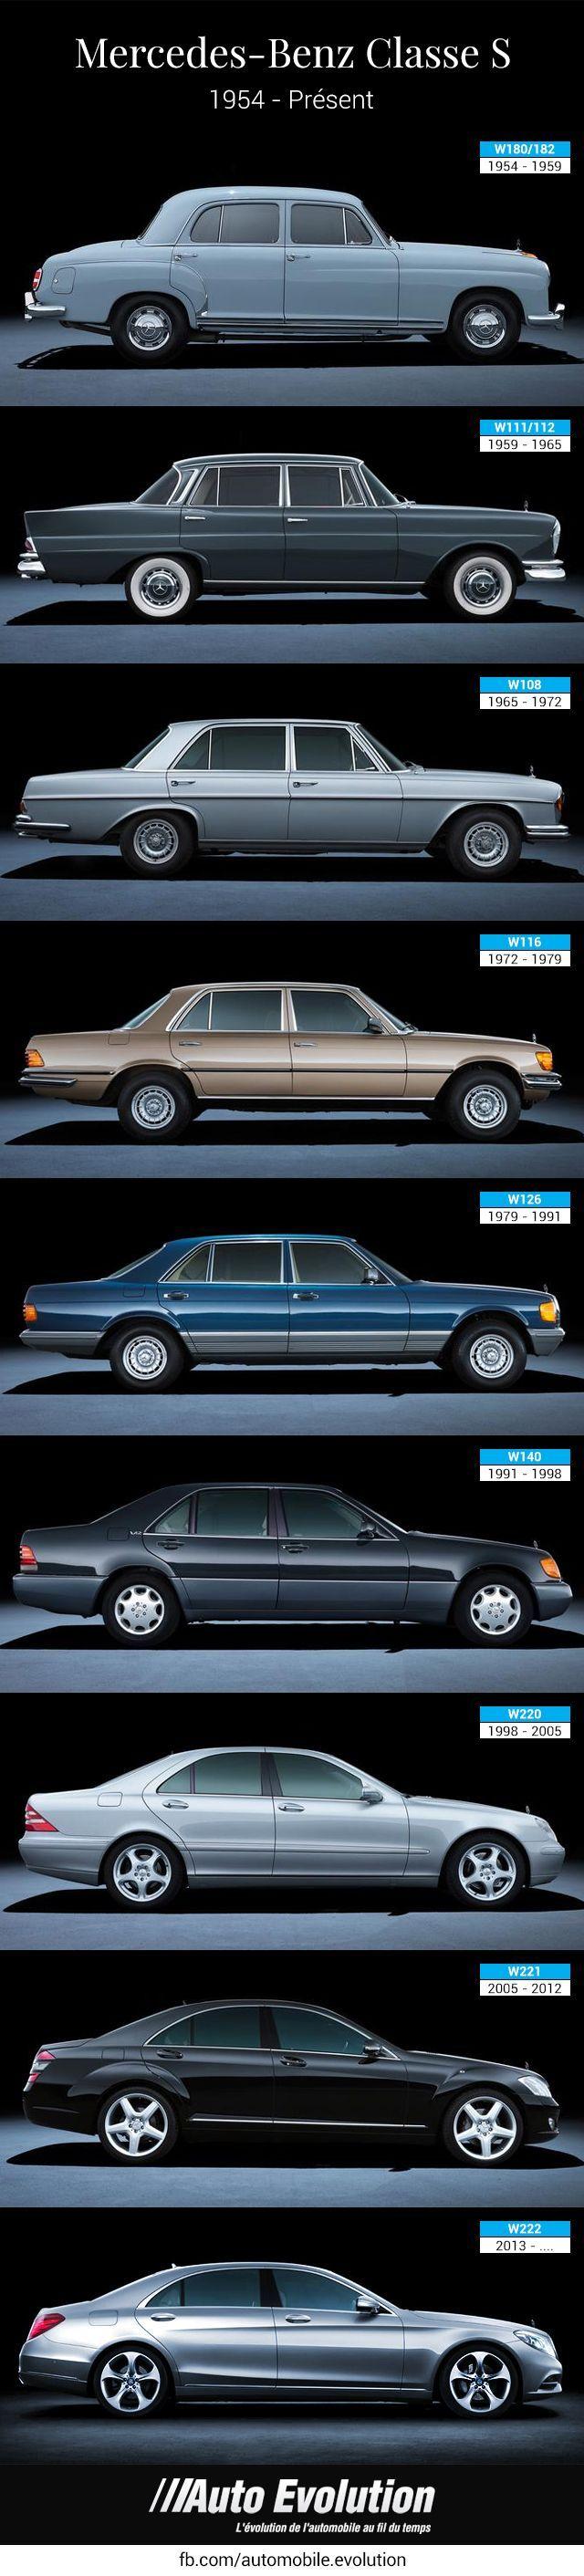 Mercedes Benz Classe S S-Klasse Evolution –